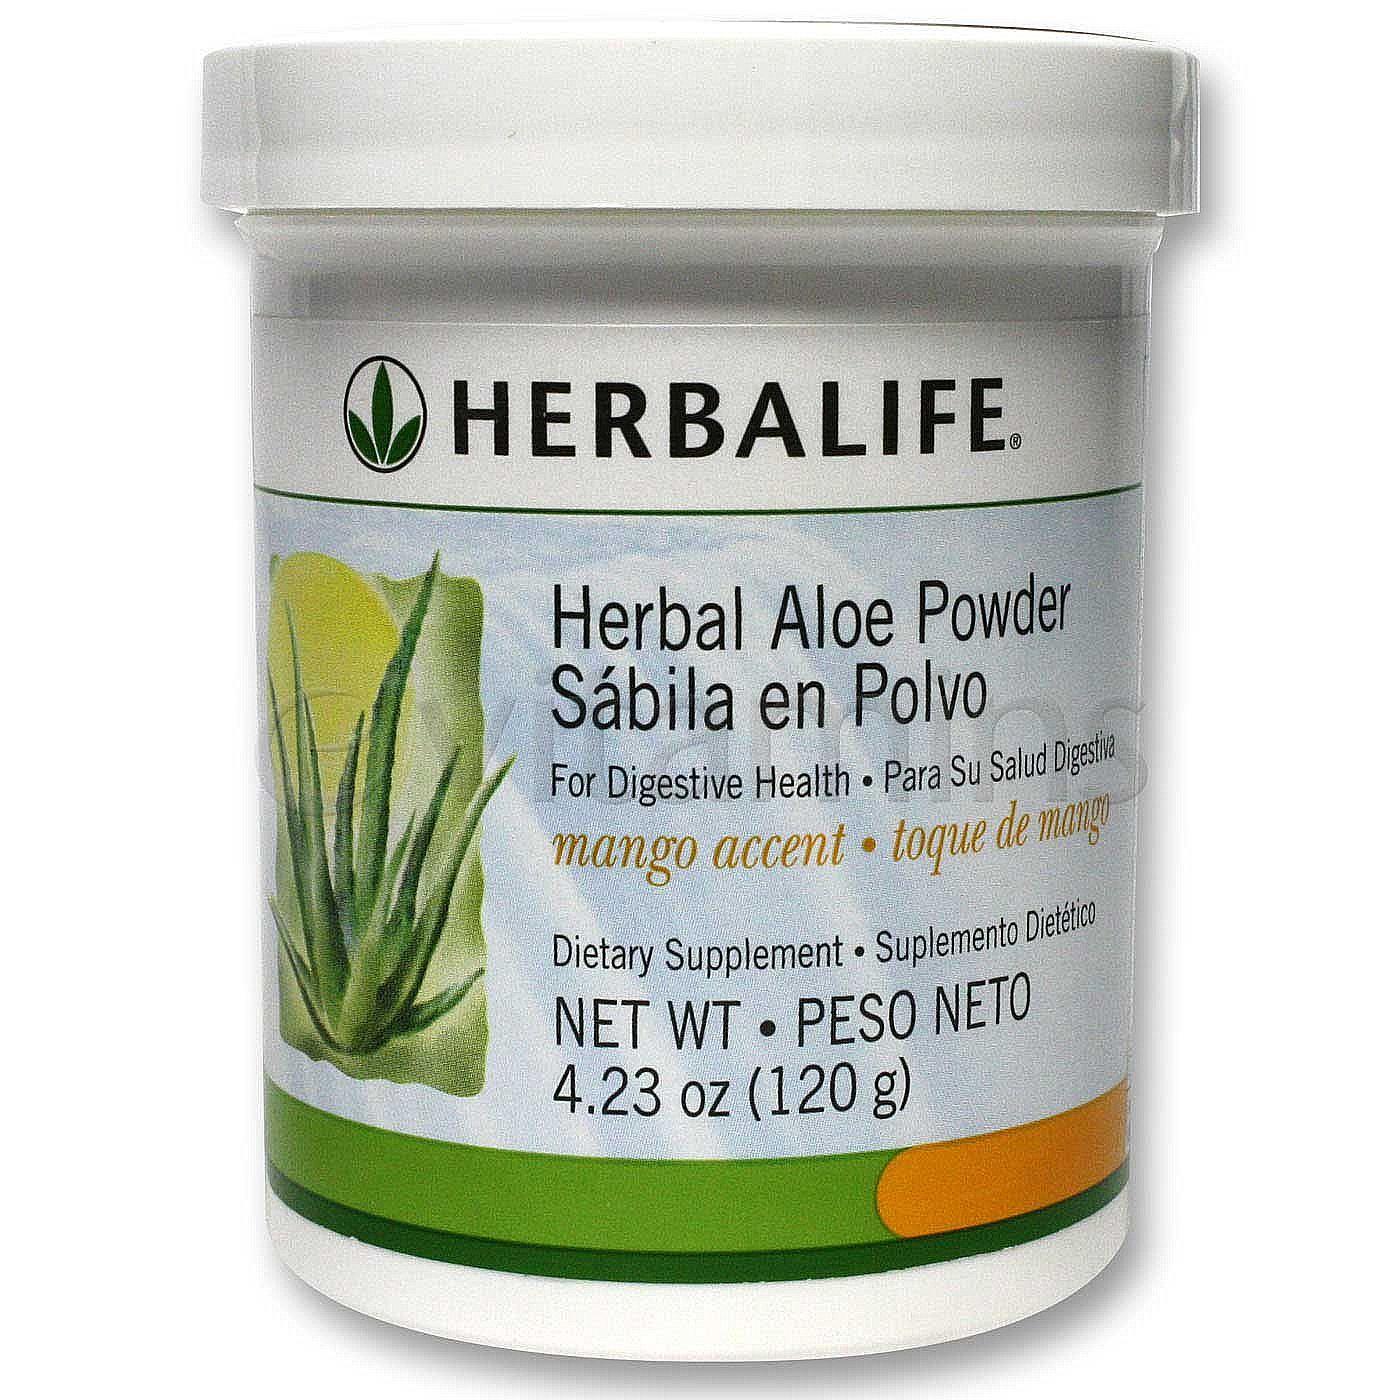 Herbalife Herbal Aloe Powder - Mango Accent - 4.23 oz ...